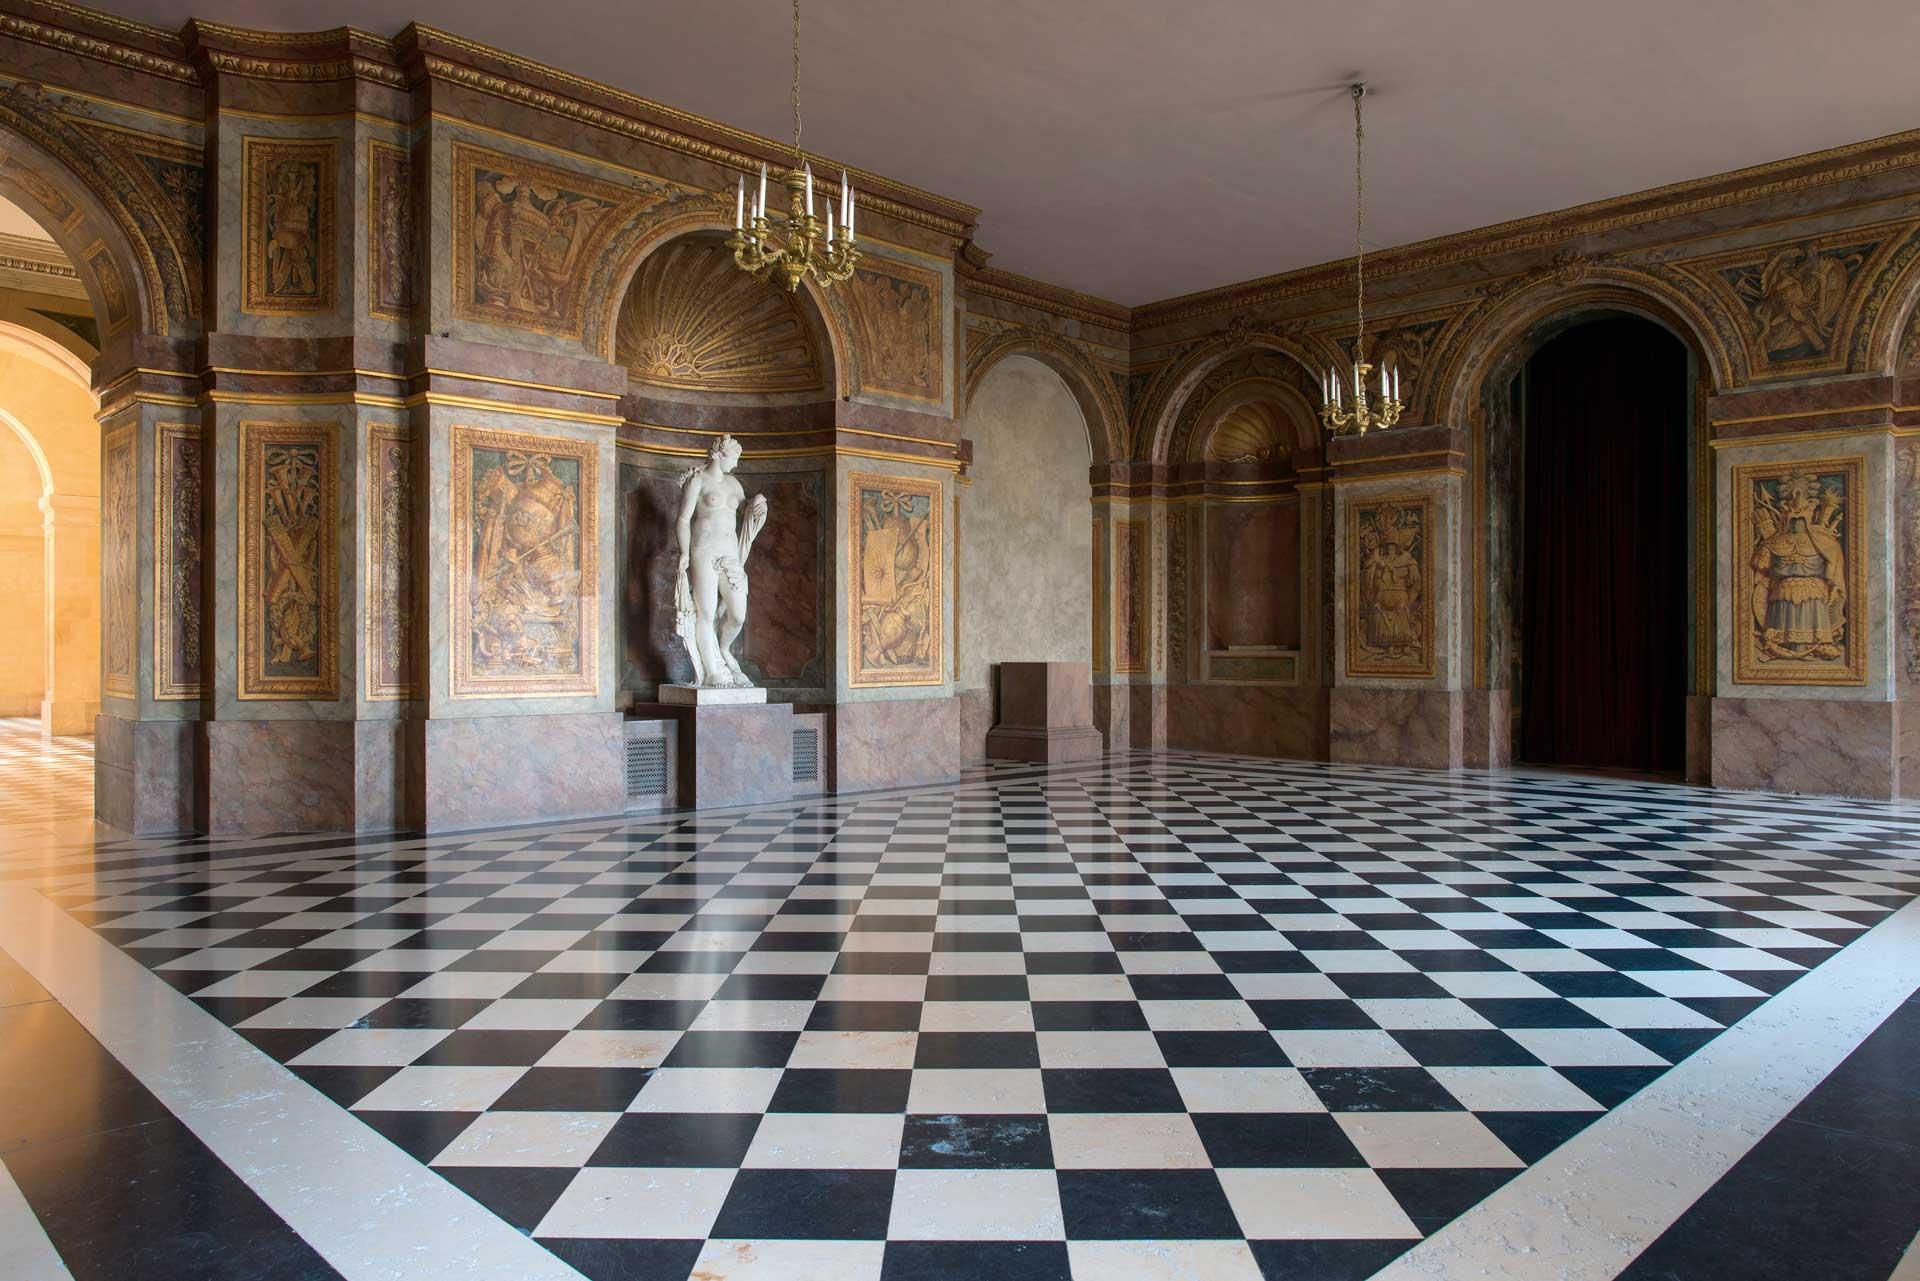 Palacio de Versalles, Château de Versailles, Grand Trianon ...